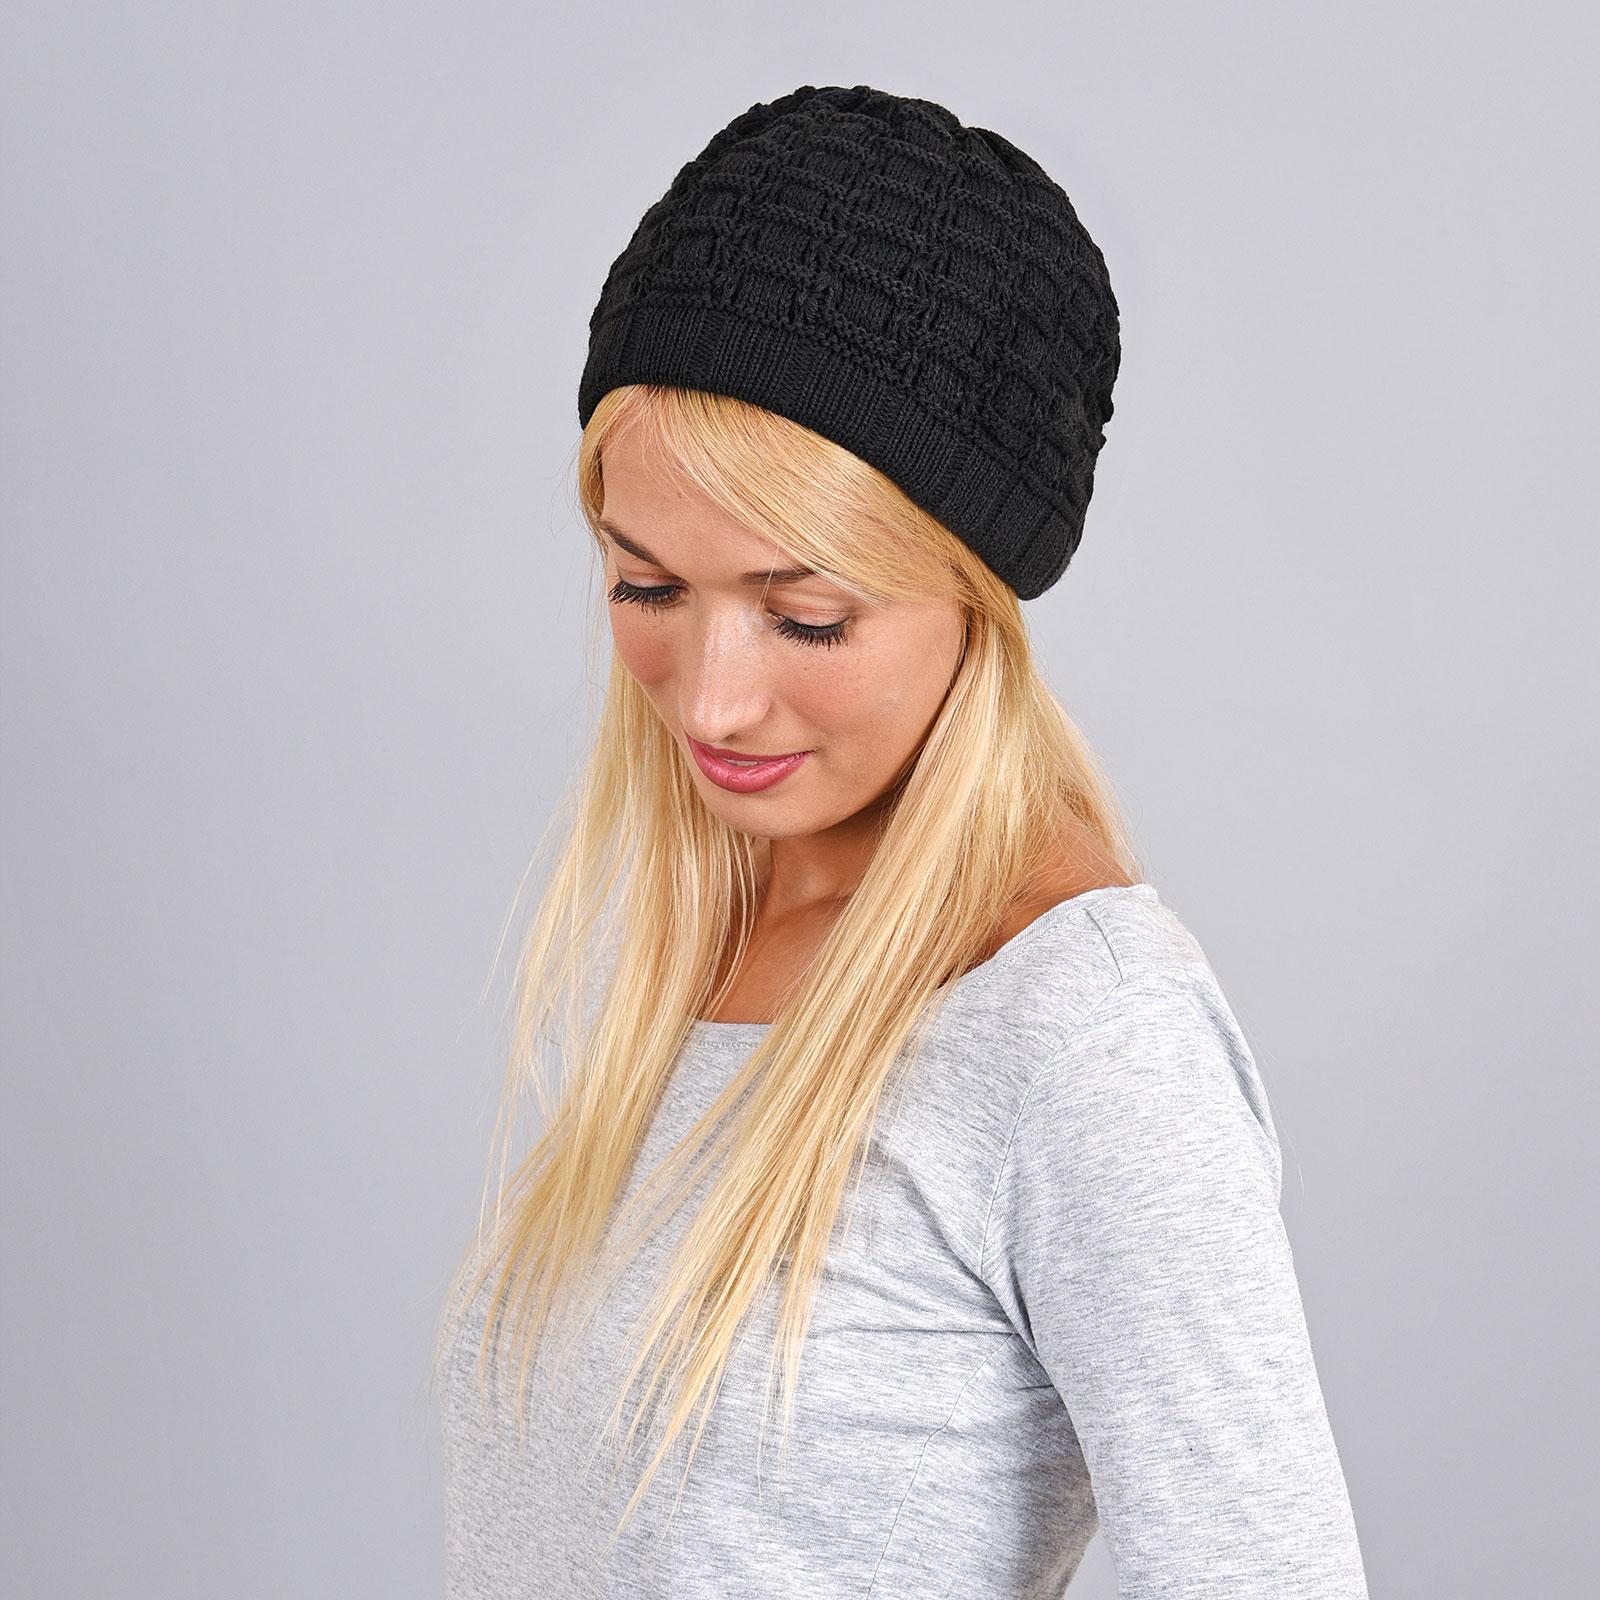 CP-00862-VF16-bonnet-femme-anthracite